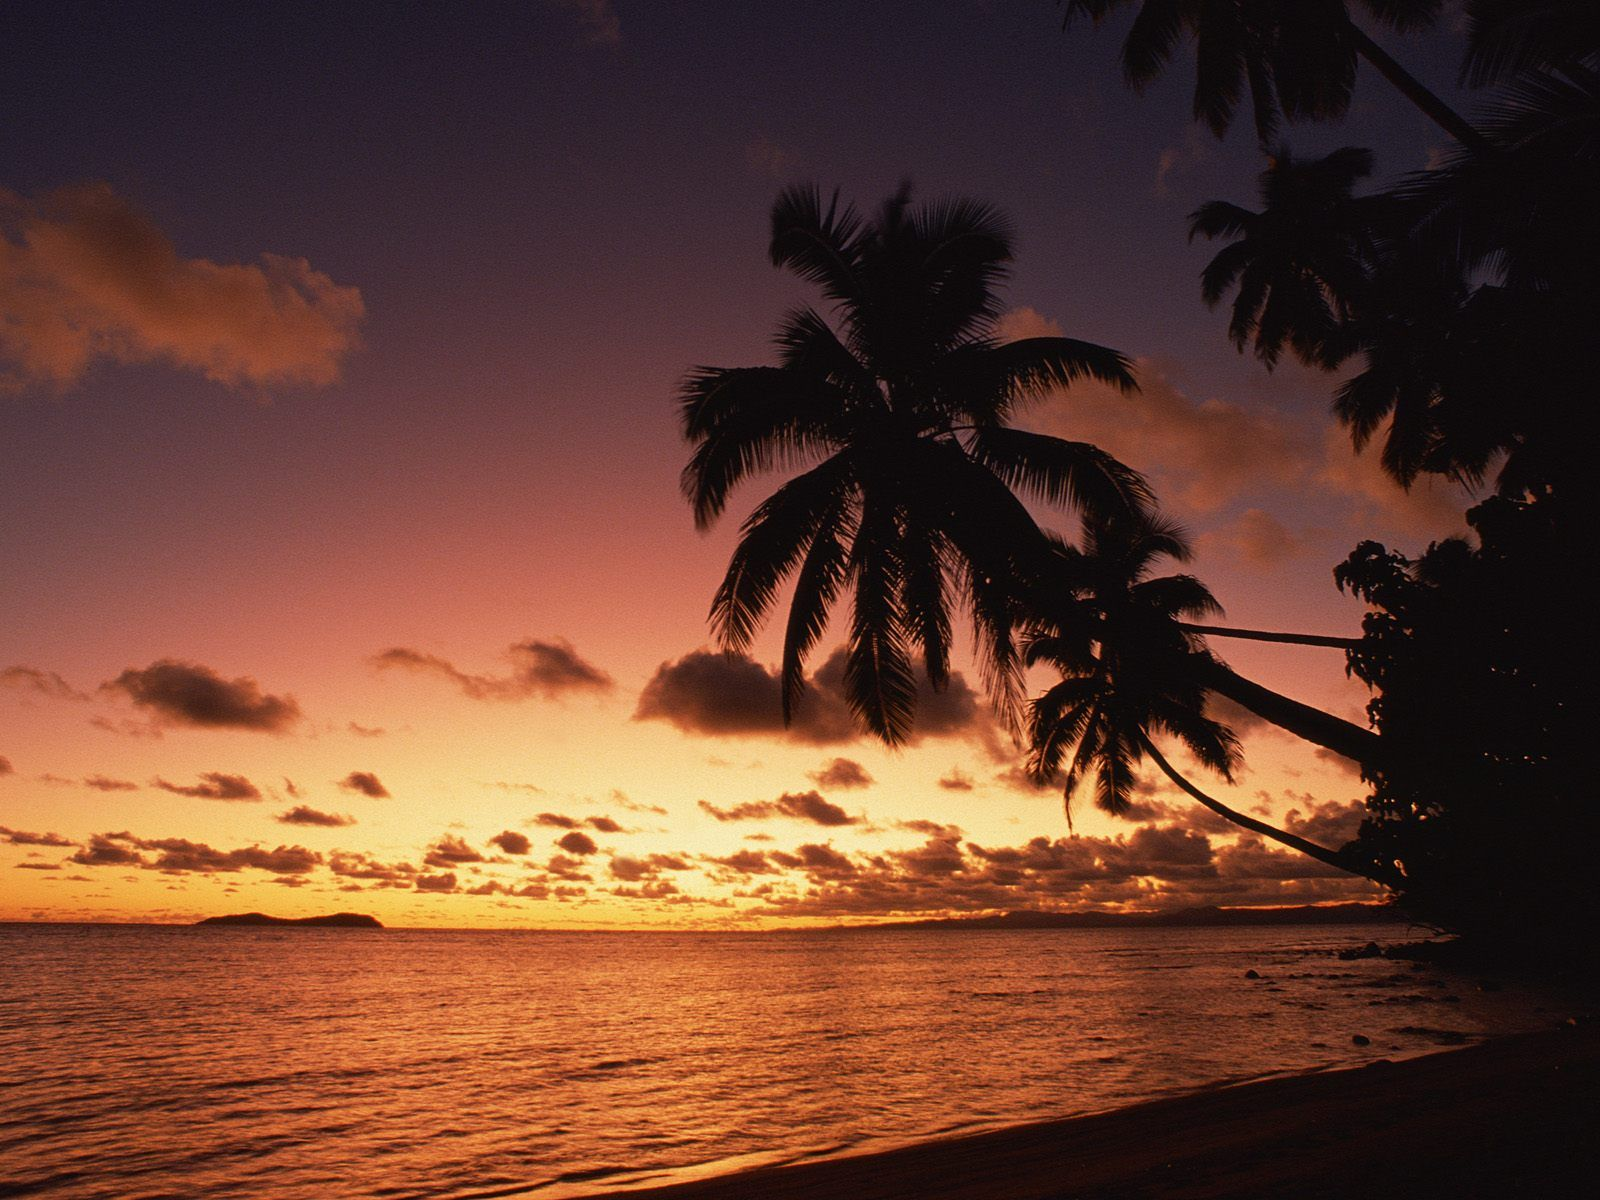 Island Sunset Fiji Nature 1600x1200